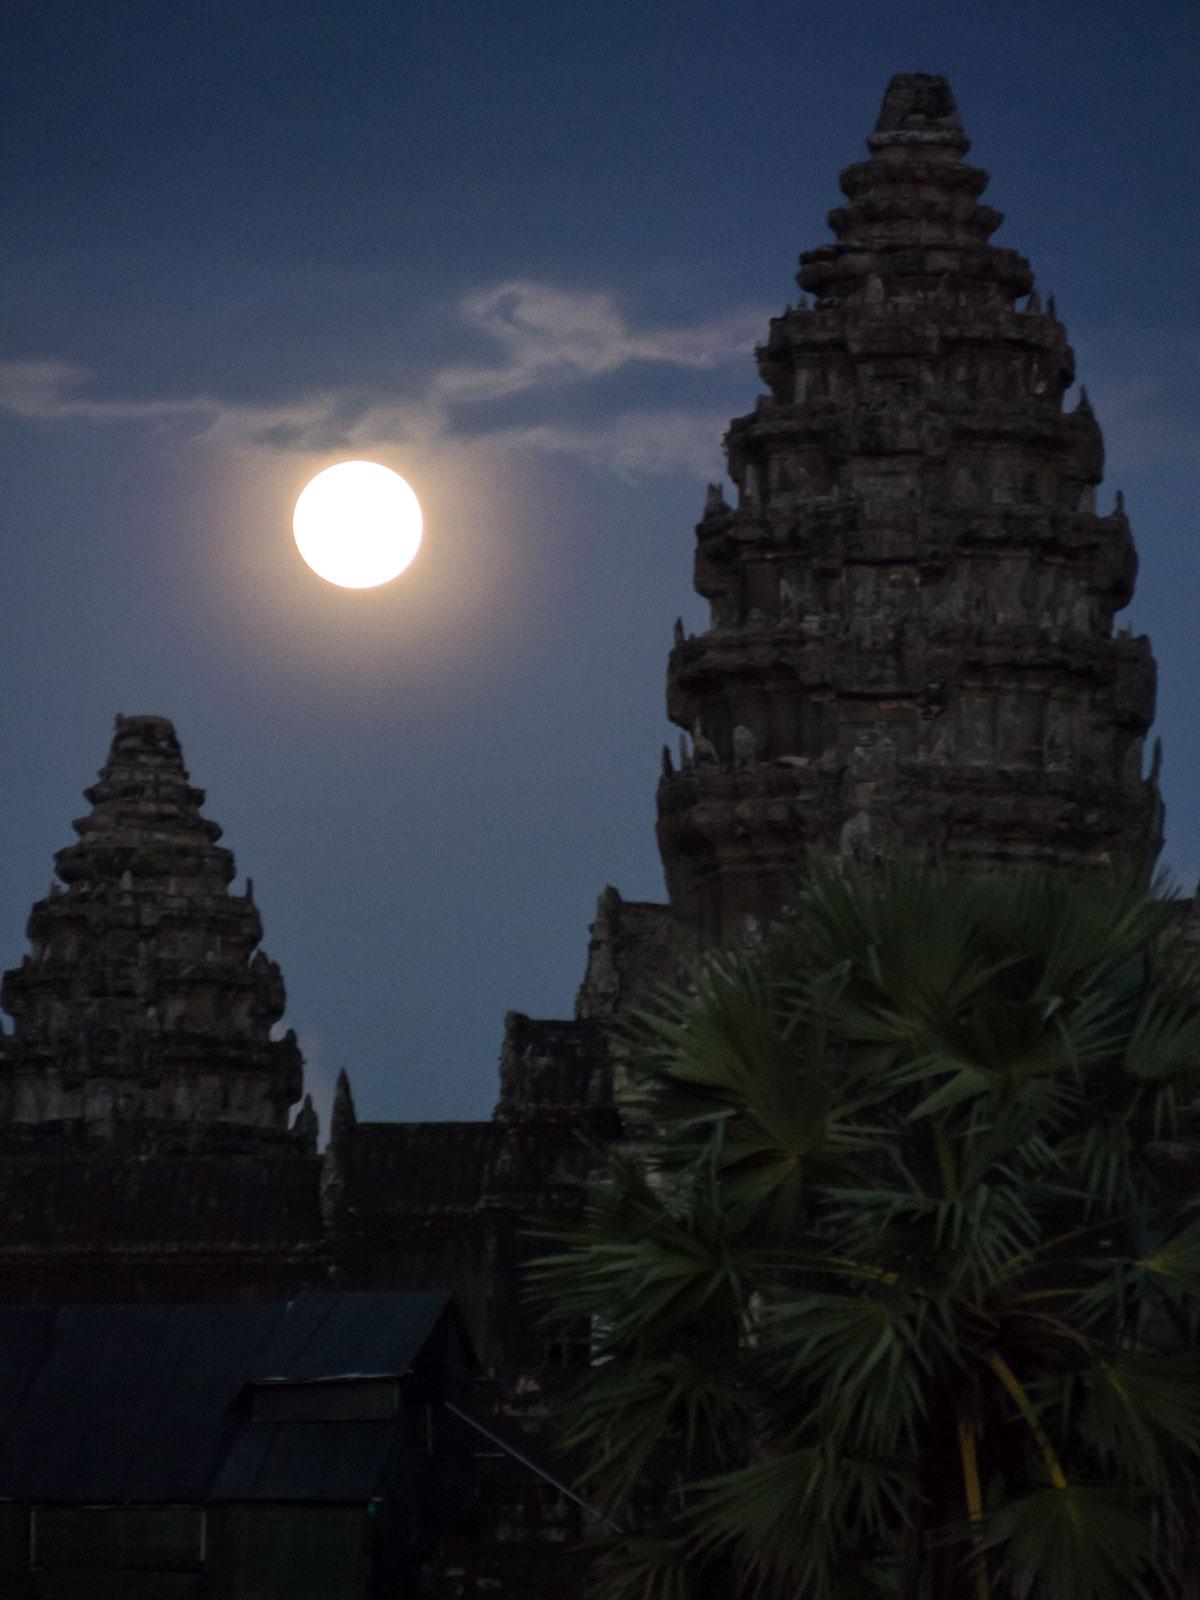 Full moon rising above Angkor Wat. ©ashleycowie.com